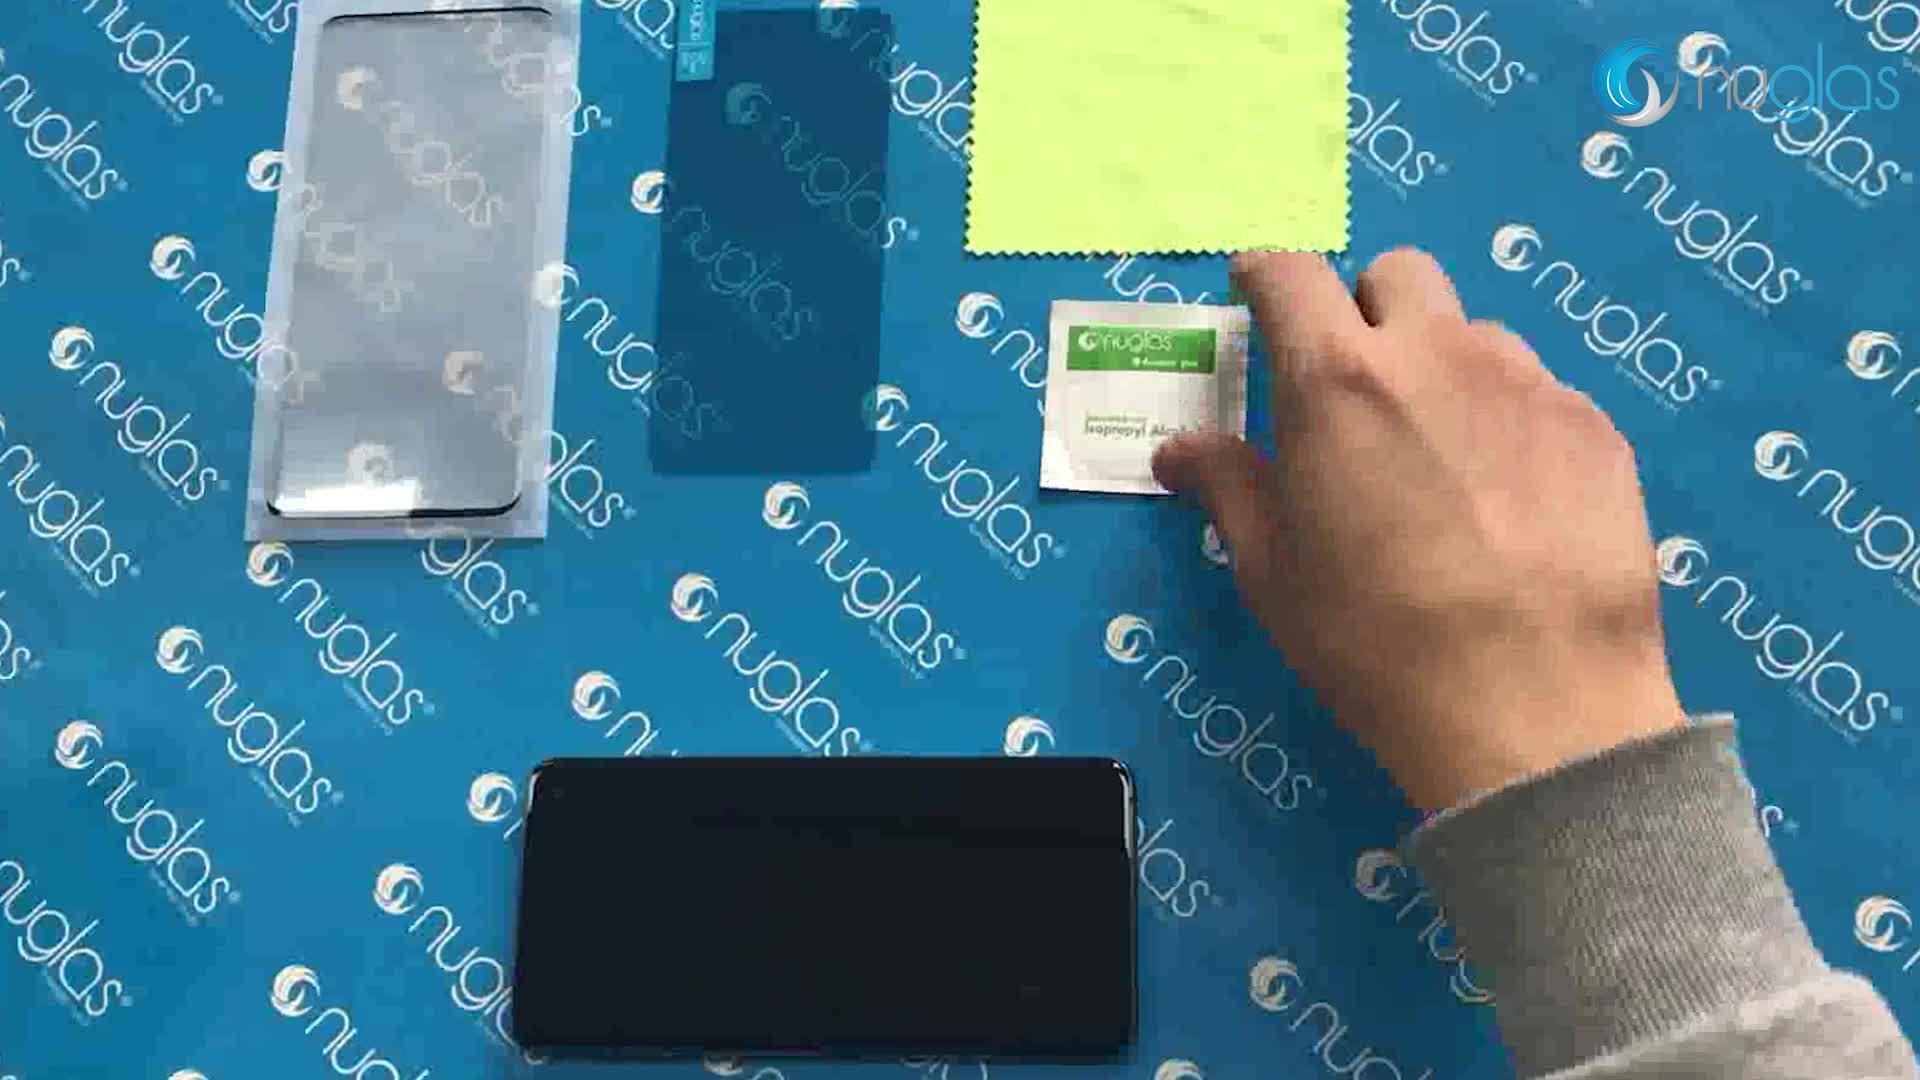 2020 Heißer Verkauf Galaxy S20 Fingerprint Entsperren 3D Gebogen Gehärtetem Glas Screen Protector